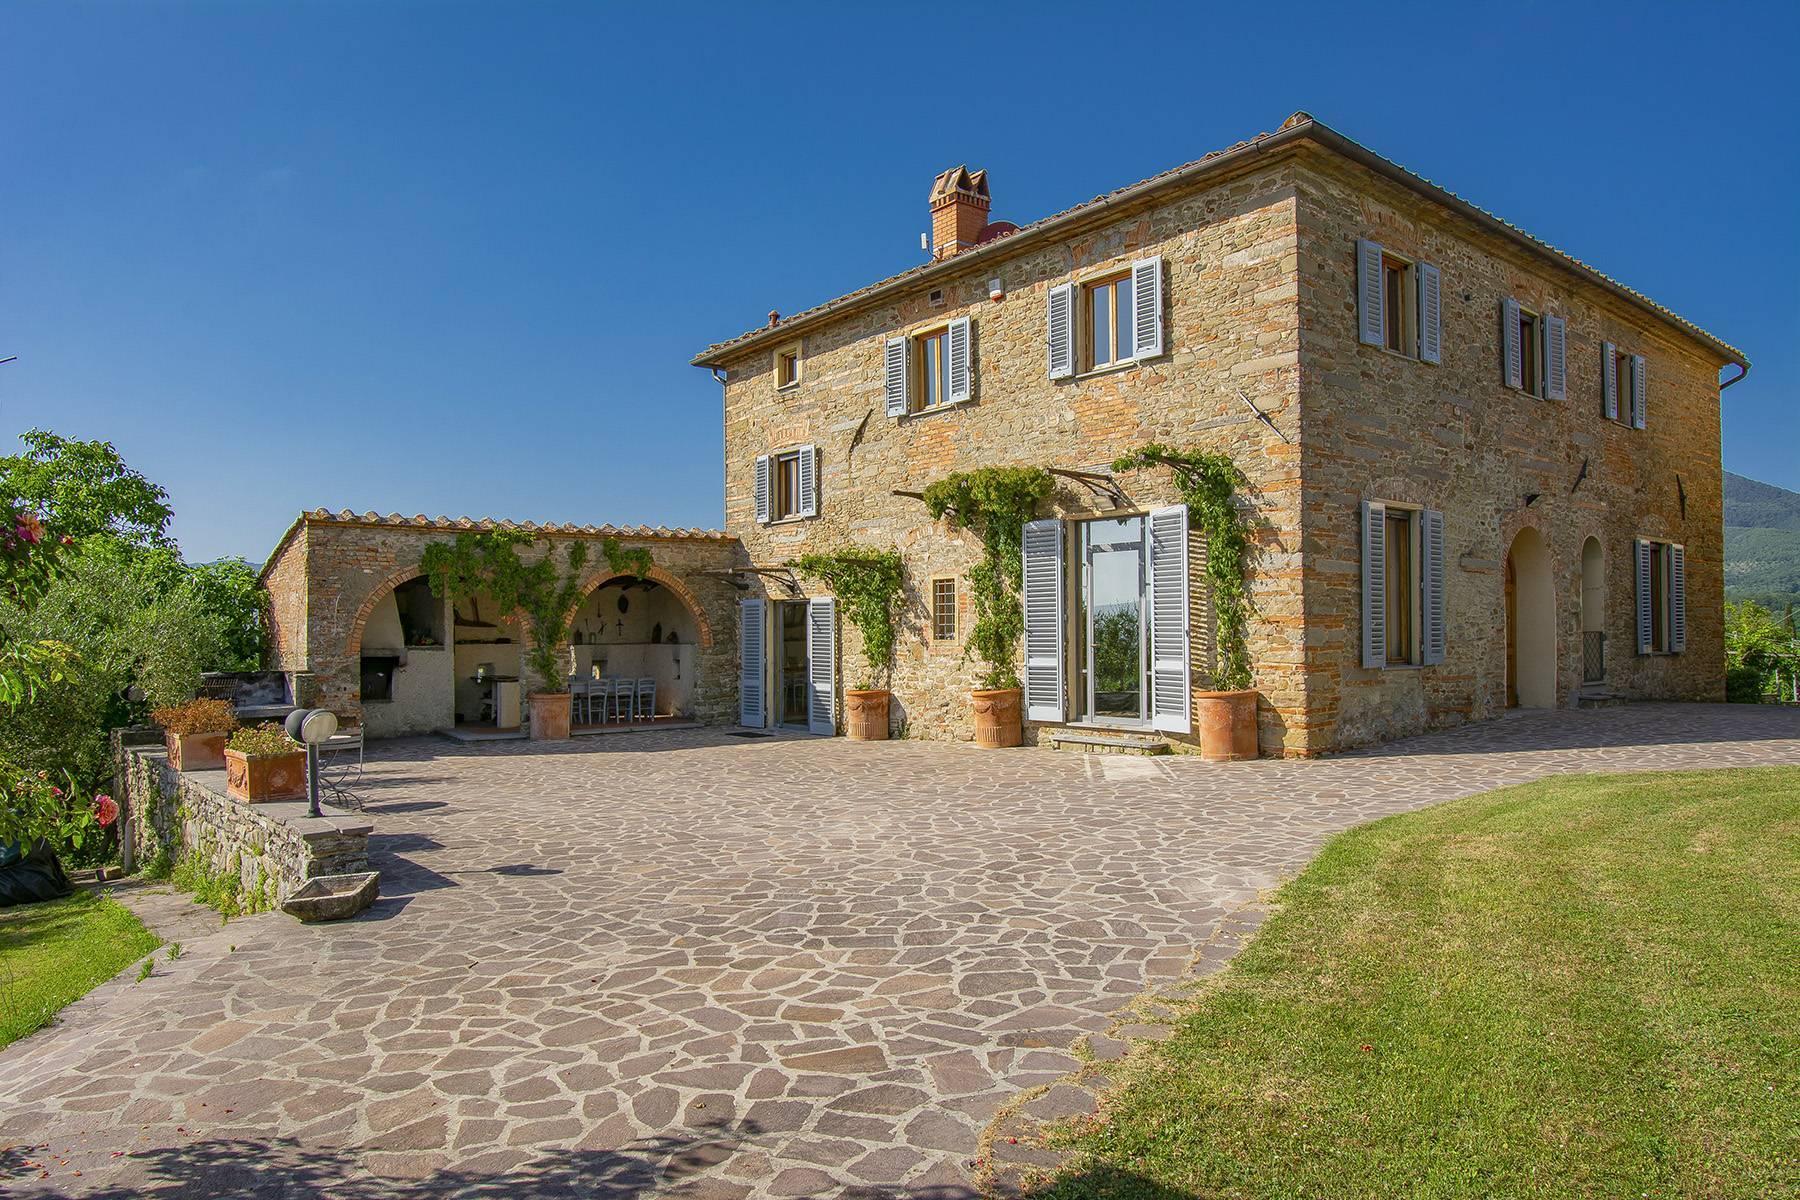 Farmhouse nestled on the Tuscan hills - 2